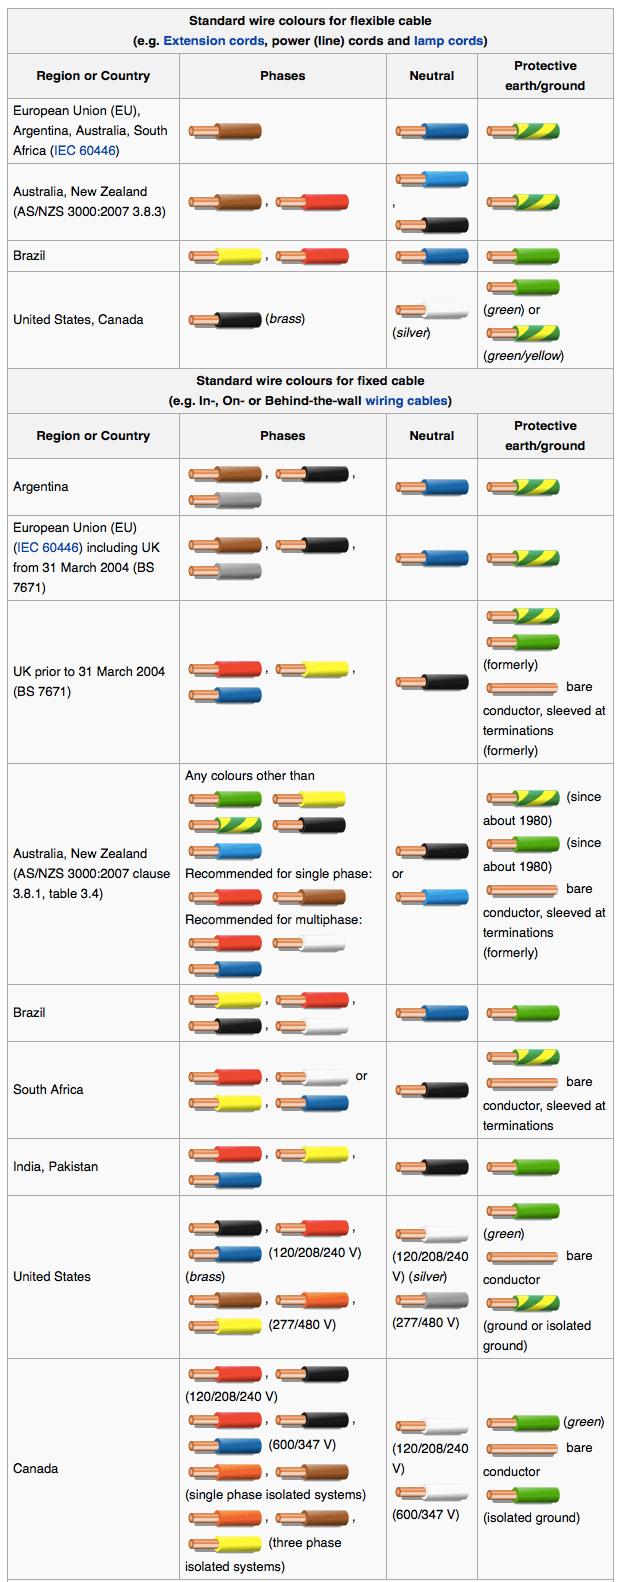 Suzuki wiring diagram color codes wiring diagrams schematics electrical wiring diagrams color code abbreviations wiring gsx wiring diagram signs electronic wiring color code chart suzuki 1997 wiring diagram color asfbconference2016 Gallery